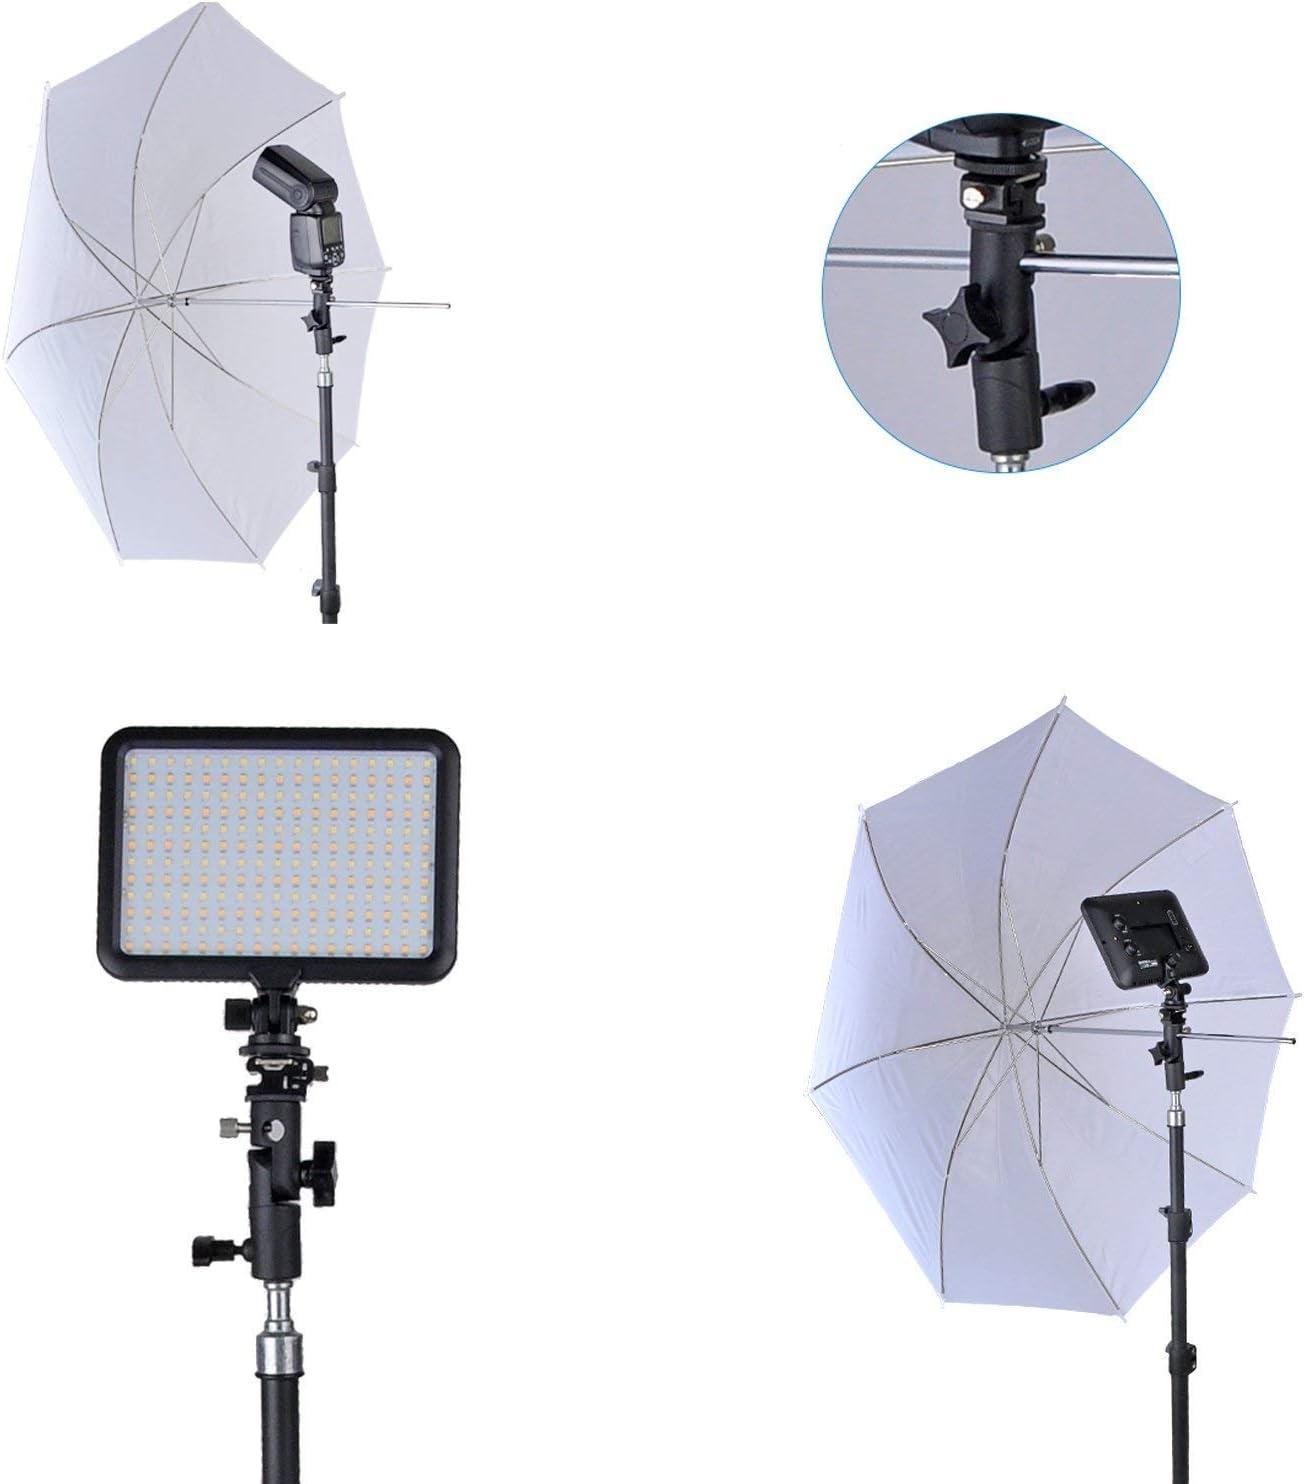 Semoic Camera Flash Speedlite Mount,Professional Swivel Light Stand Light Bracket Umbrella Bracket Mount Shoe Holder E Type for Canon Nikon Pentax Olympus and Speedlite Flashe